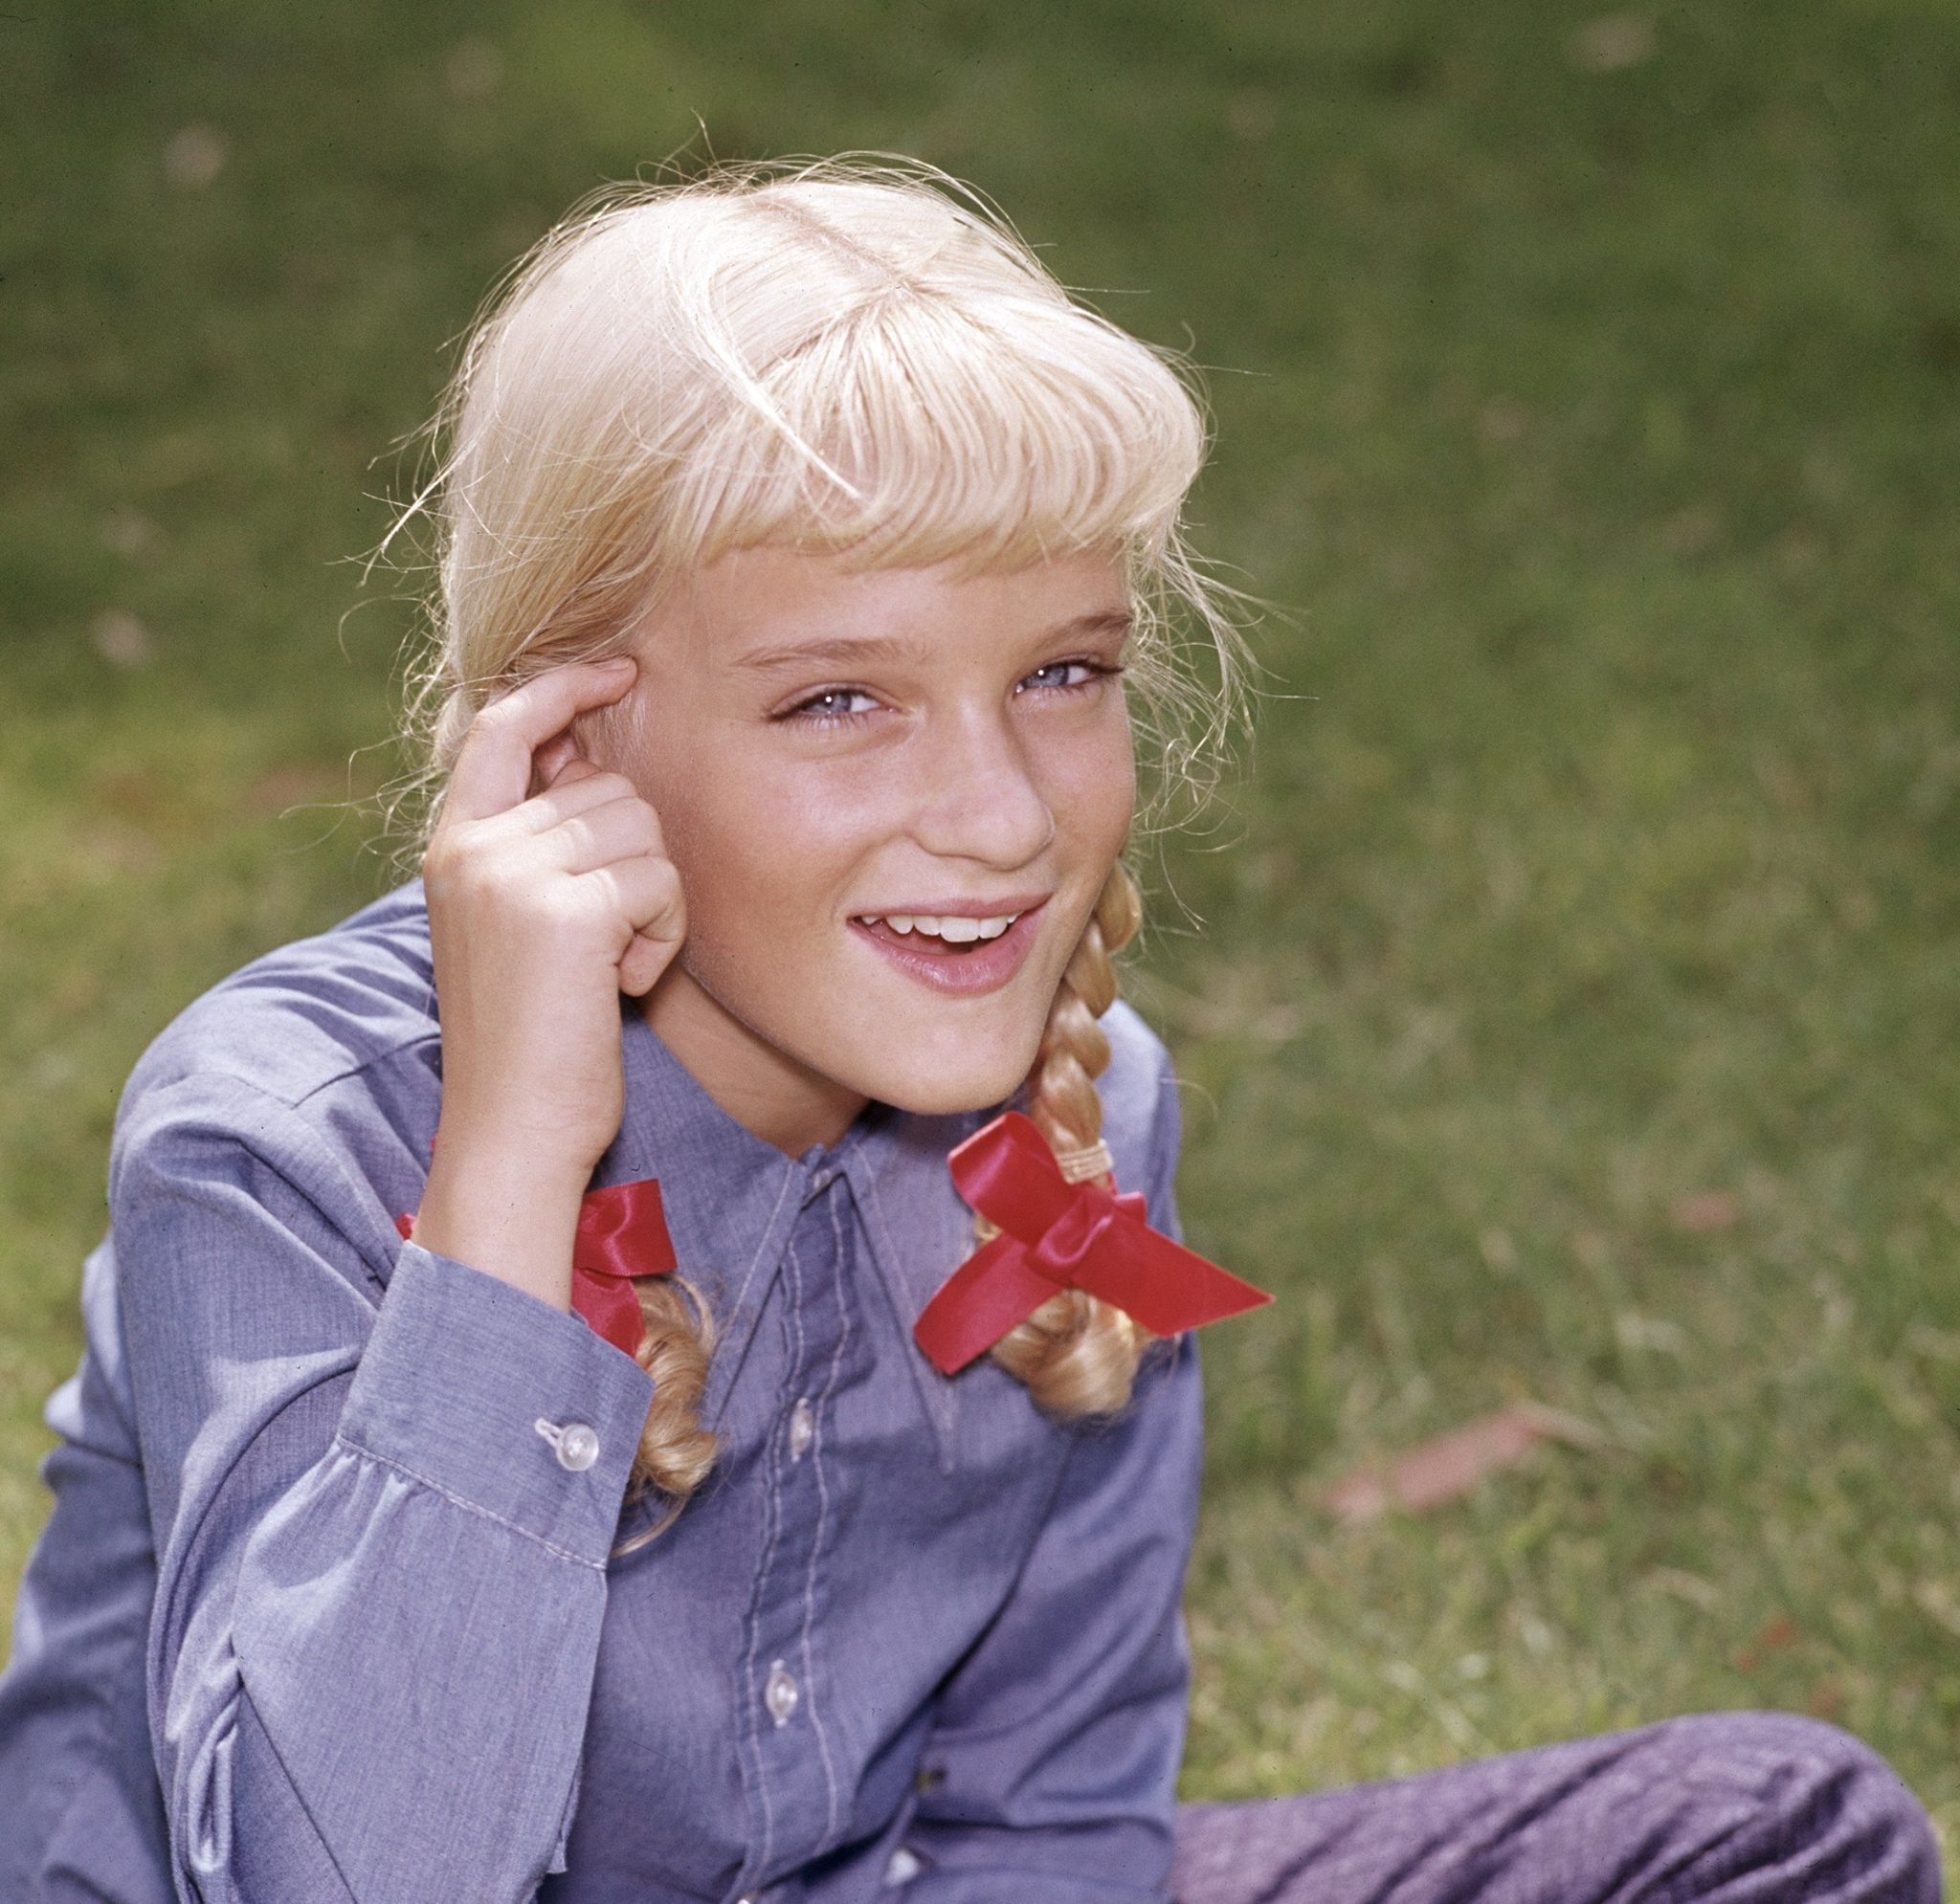 Cindy Brady Reveals Major Secrets About Her TV Family